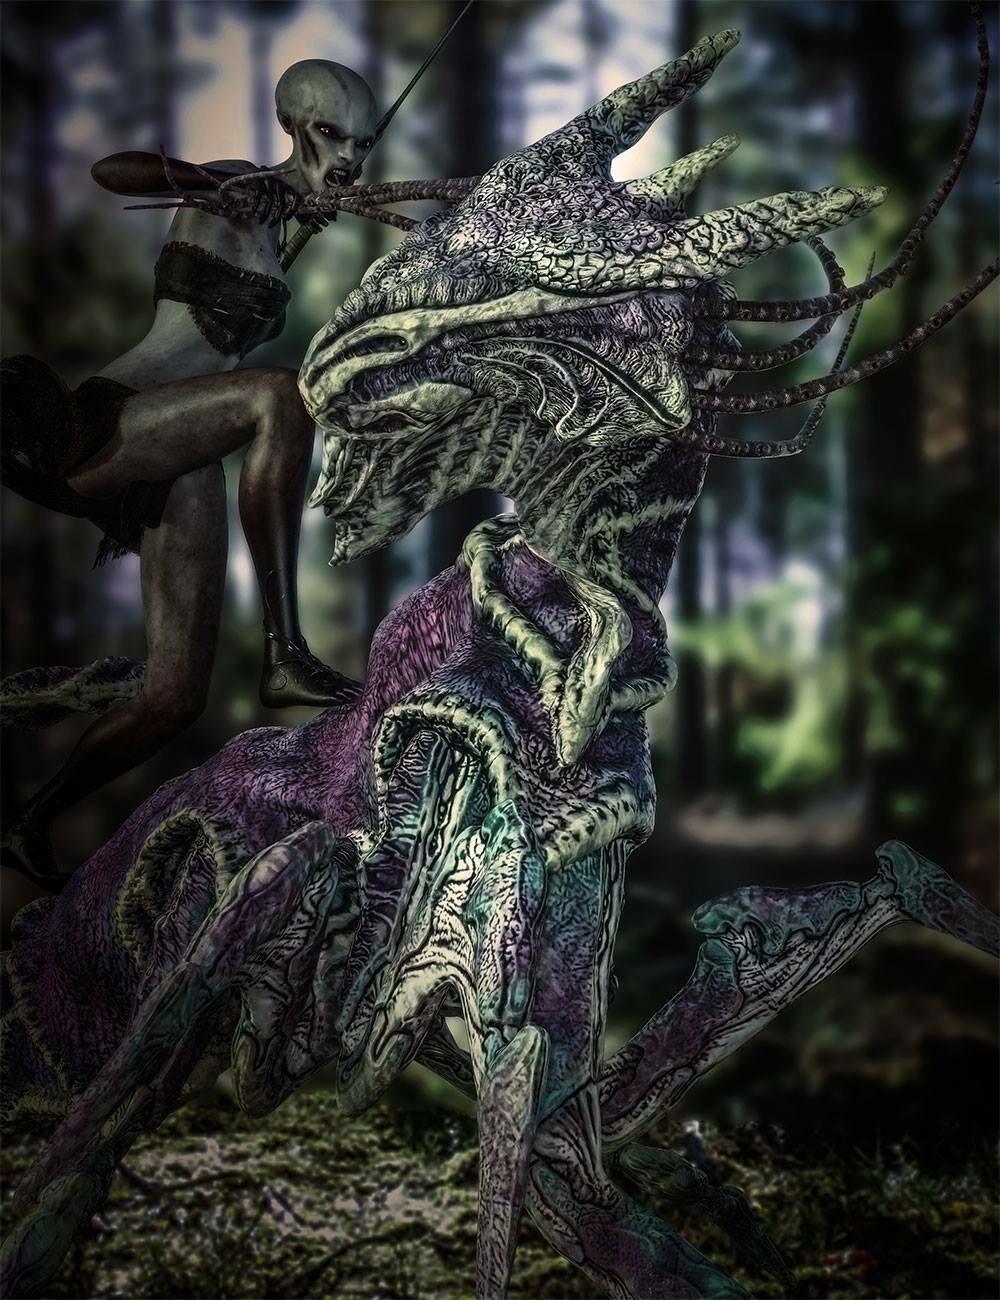 Creature by Les L. Garner Render by Lee Taylor